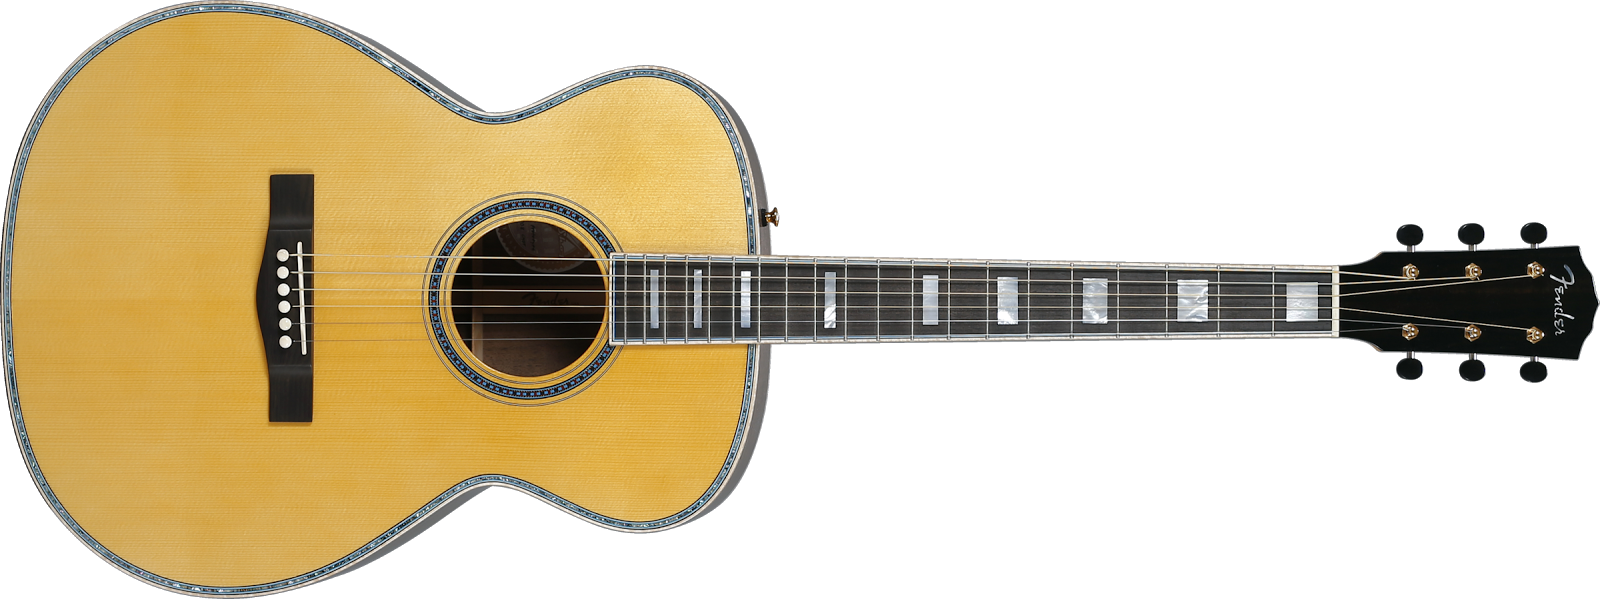 sekilas info tentang asal muasal alat musik gitar